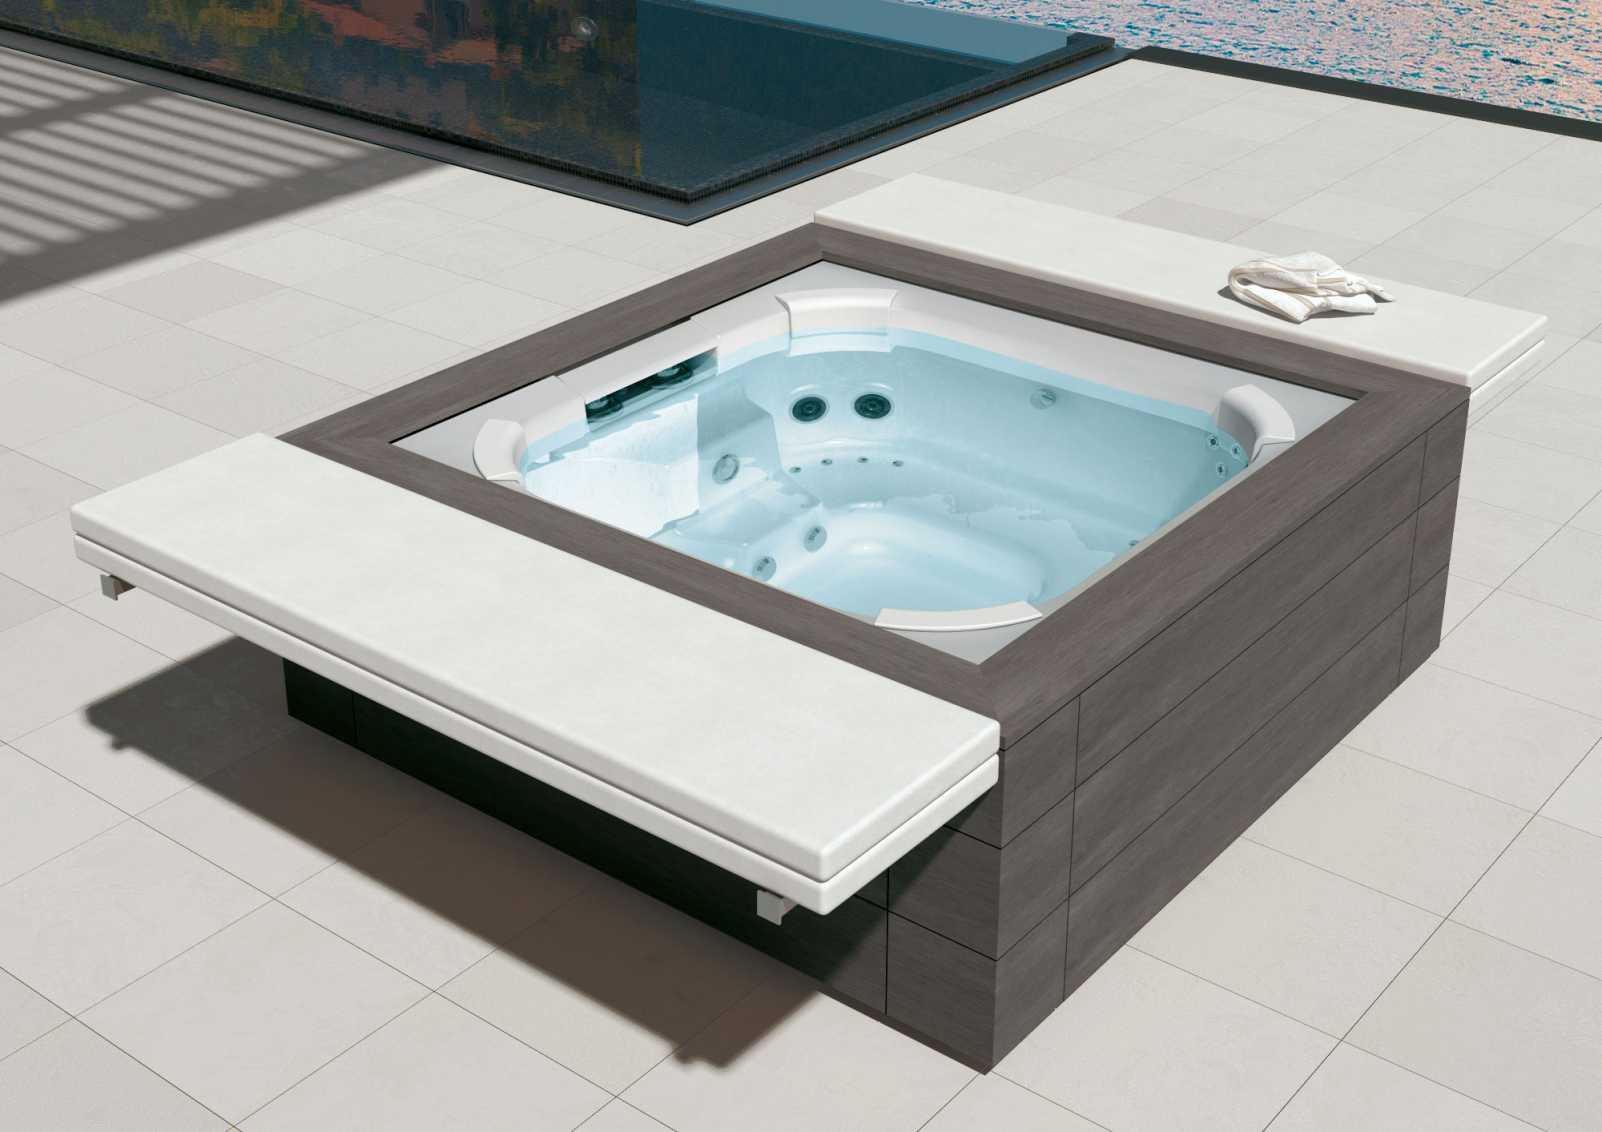 whirlpool ac schwimmbadtechnik. Black Bedroom Furniture Sets. Home Design Ideas